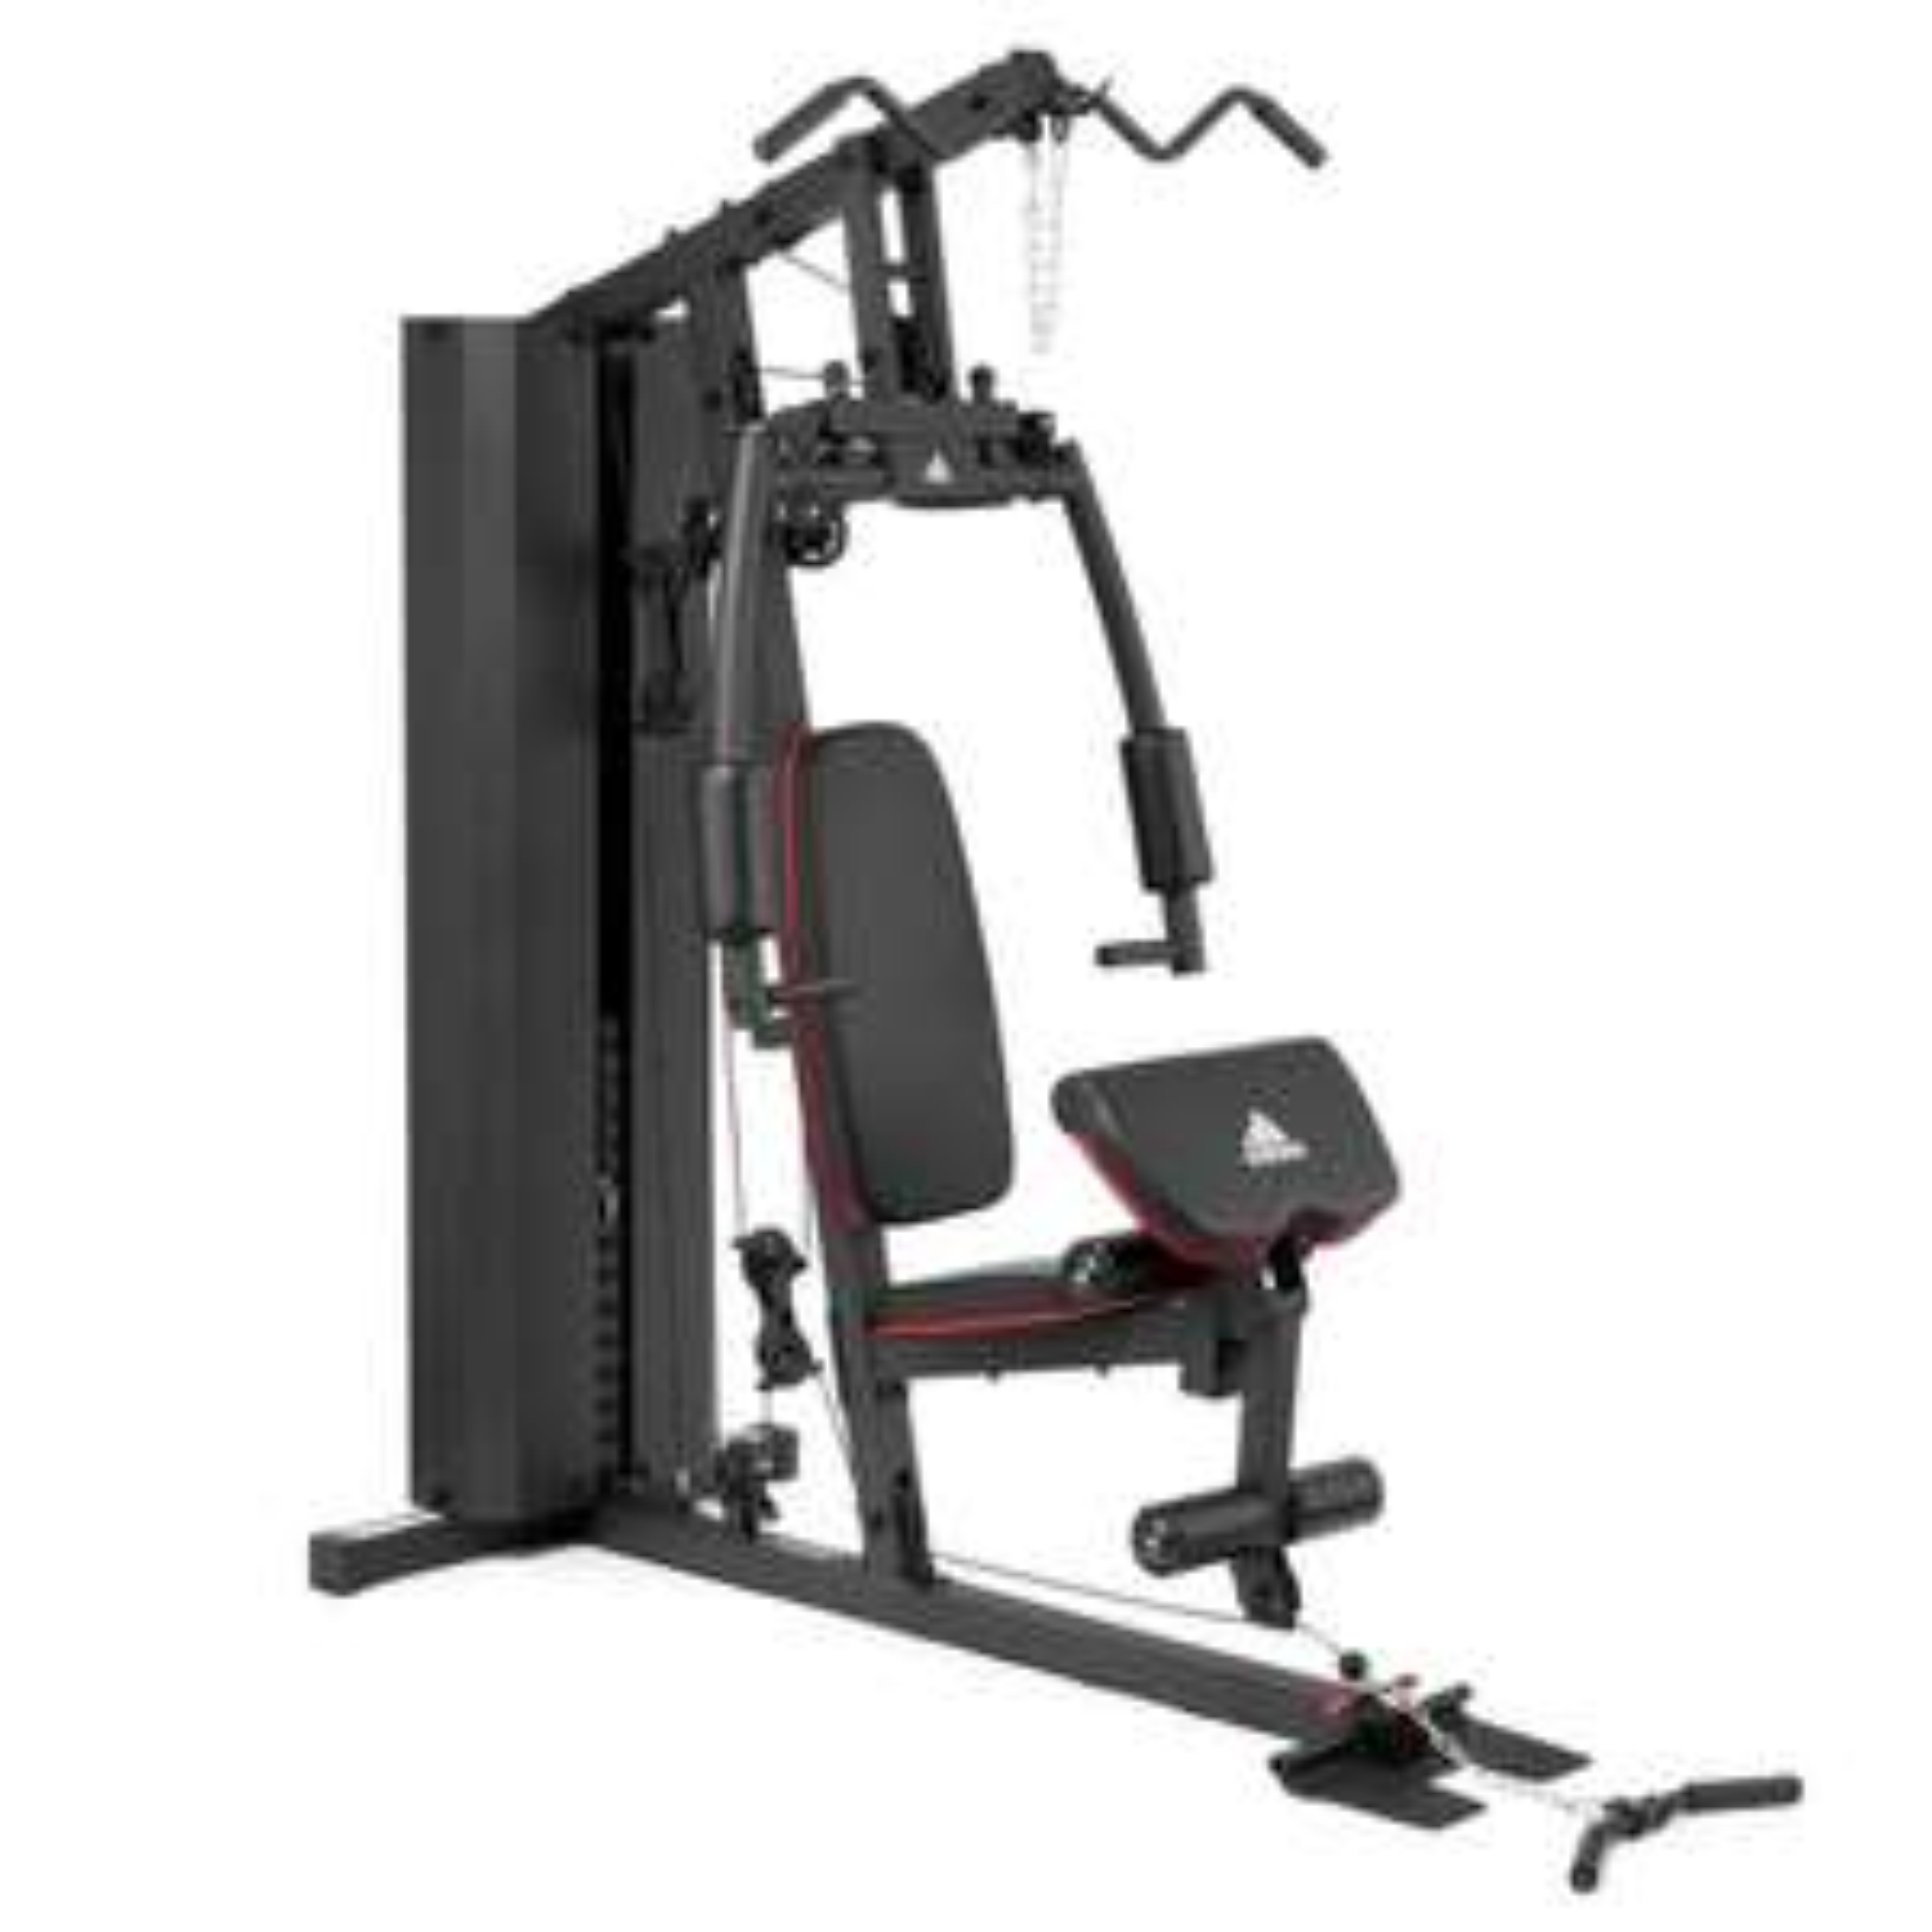 Station de musculation Adida Home Gym